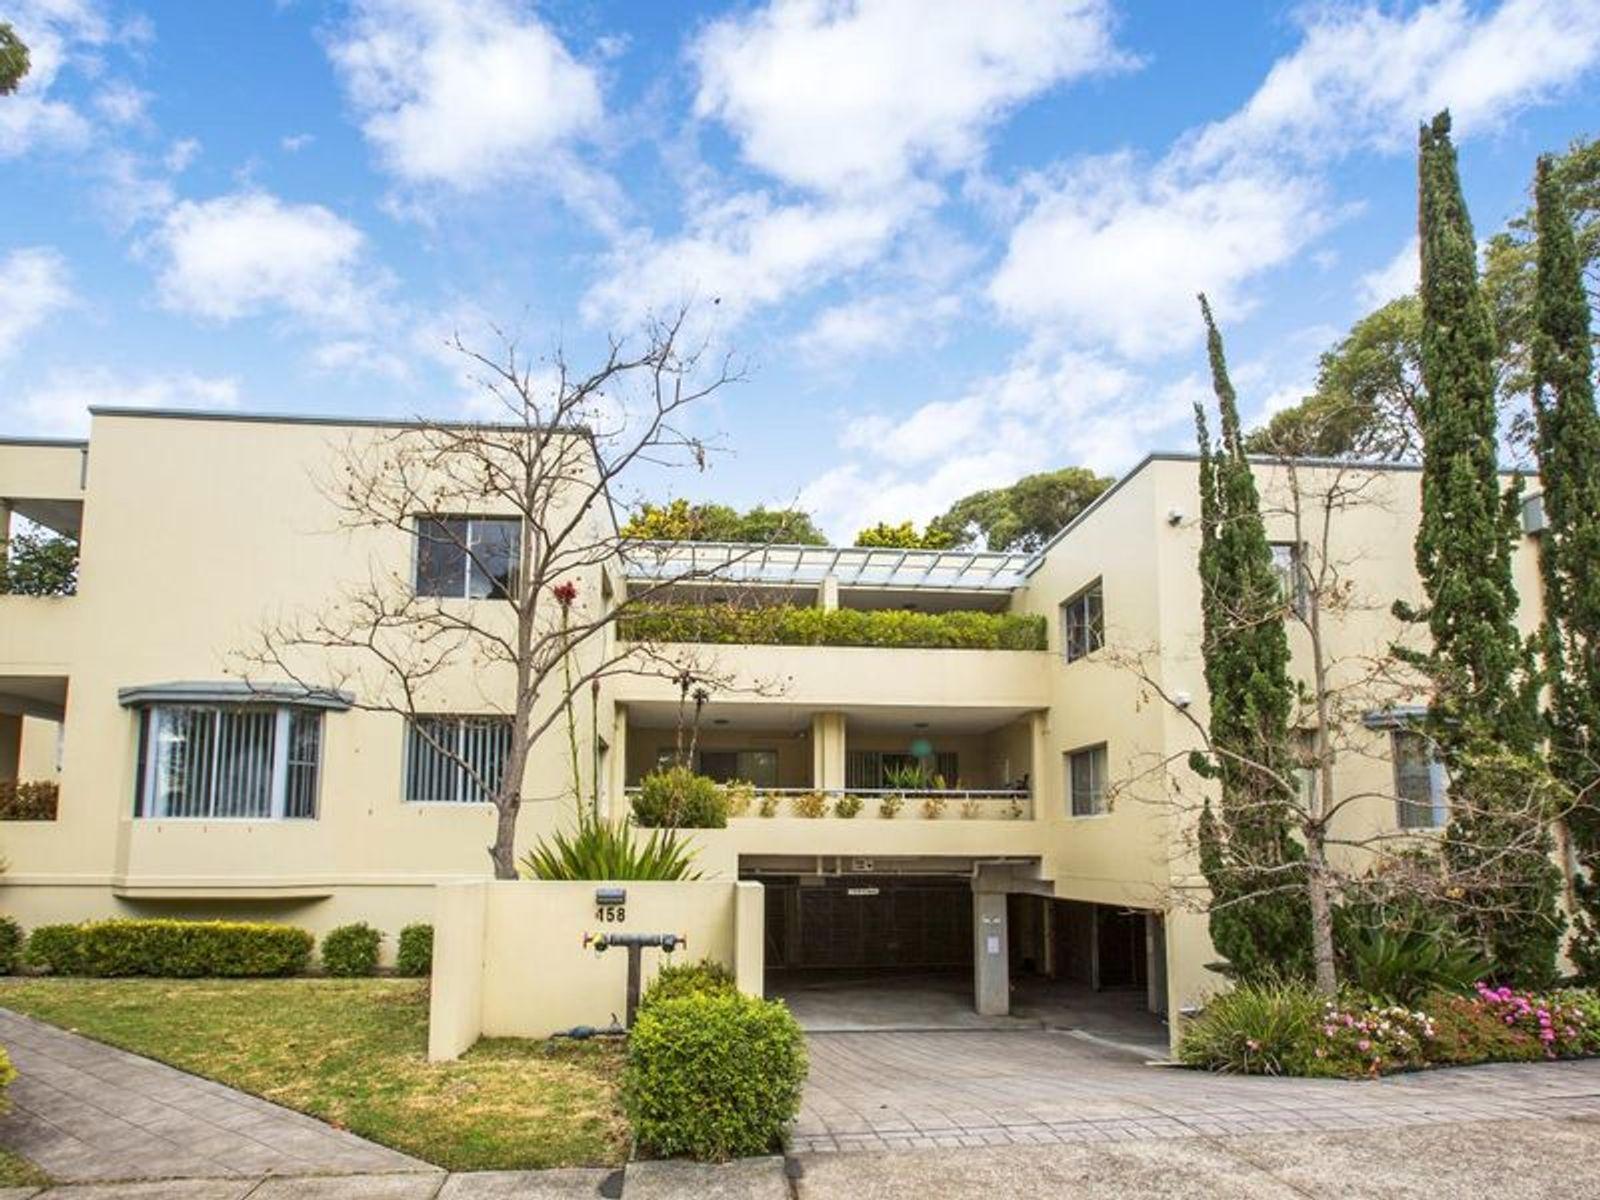 10/158 Melwood Avenue, Killarney Heights, NSW 2087